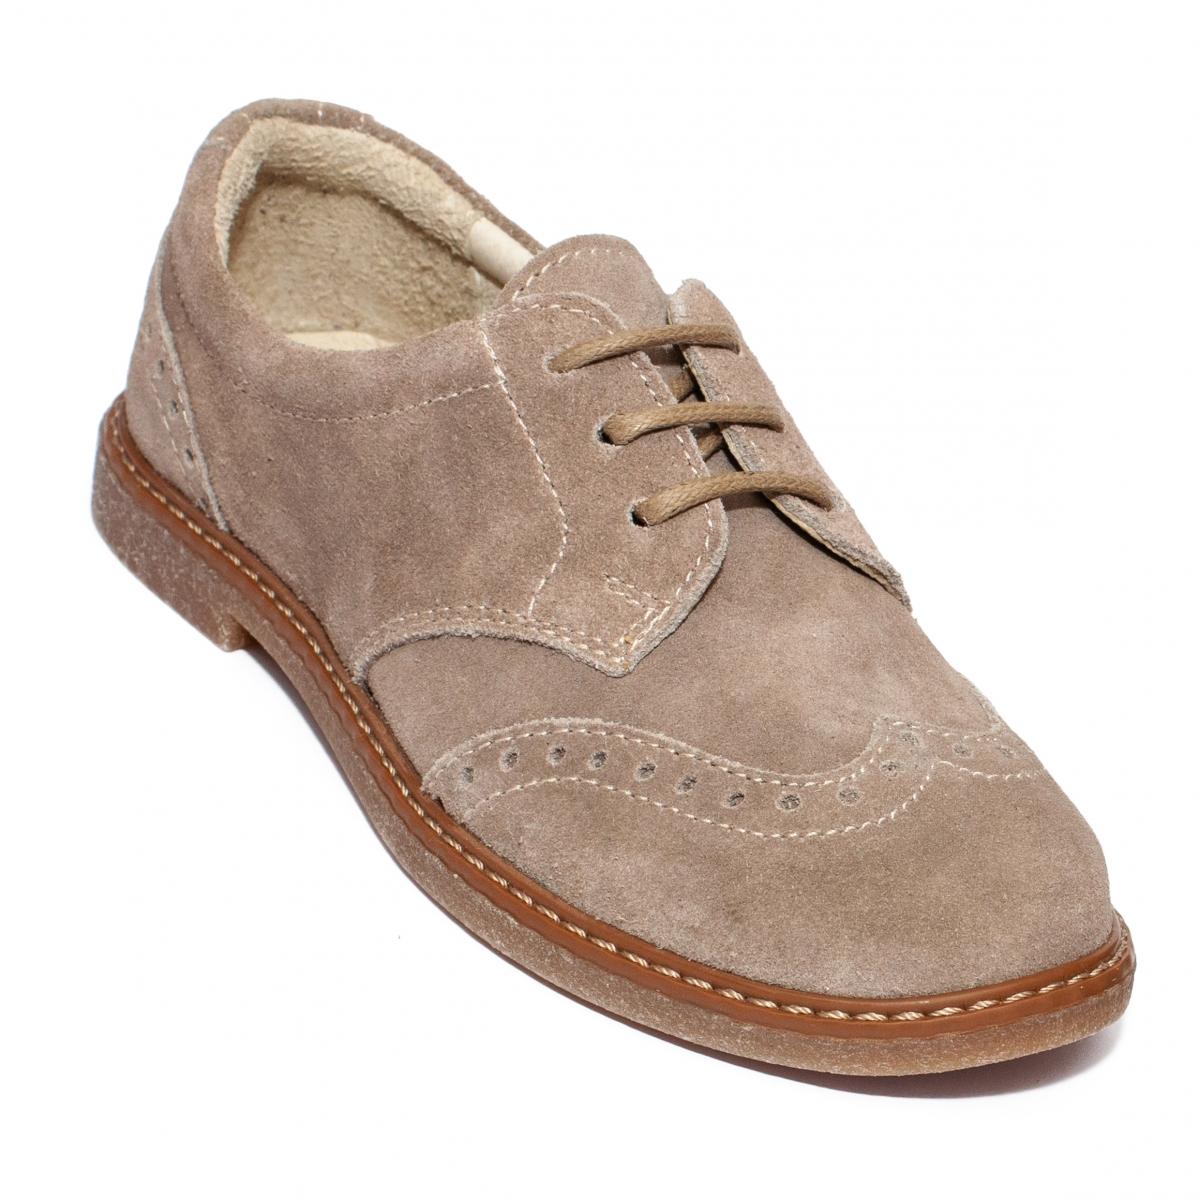 Pantofi copii din velur pj shoes Frigerio bluemarin 31-38